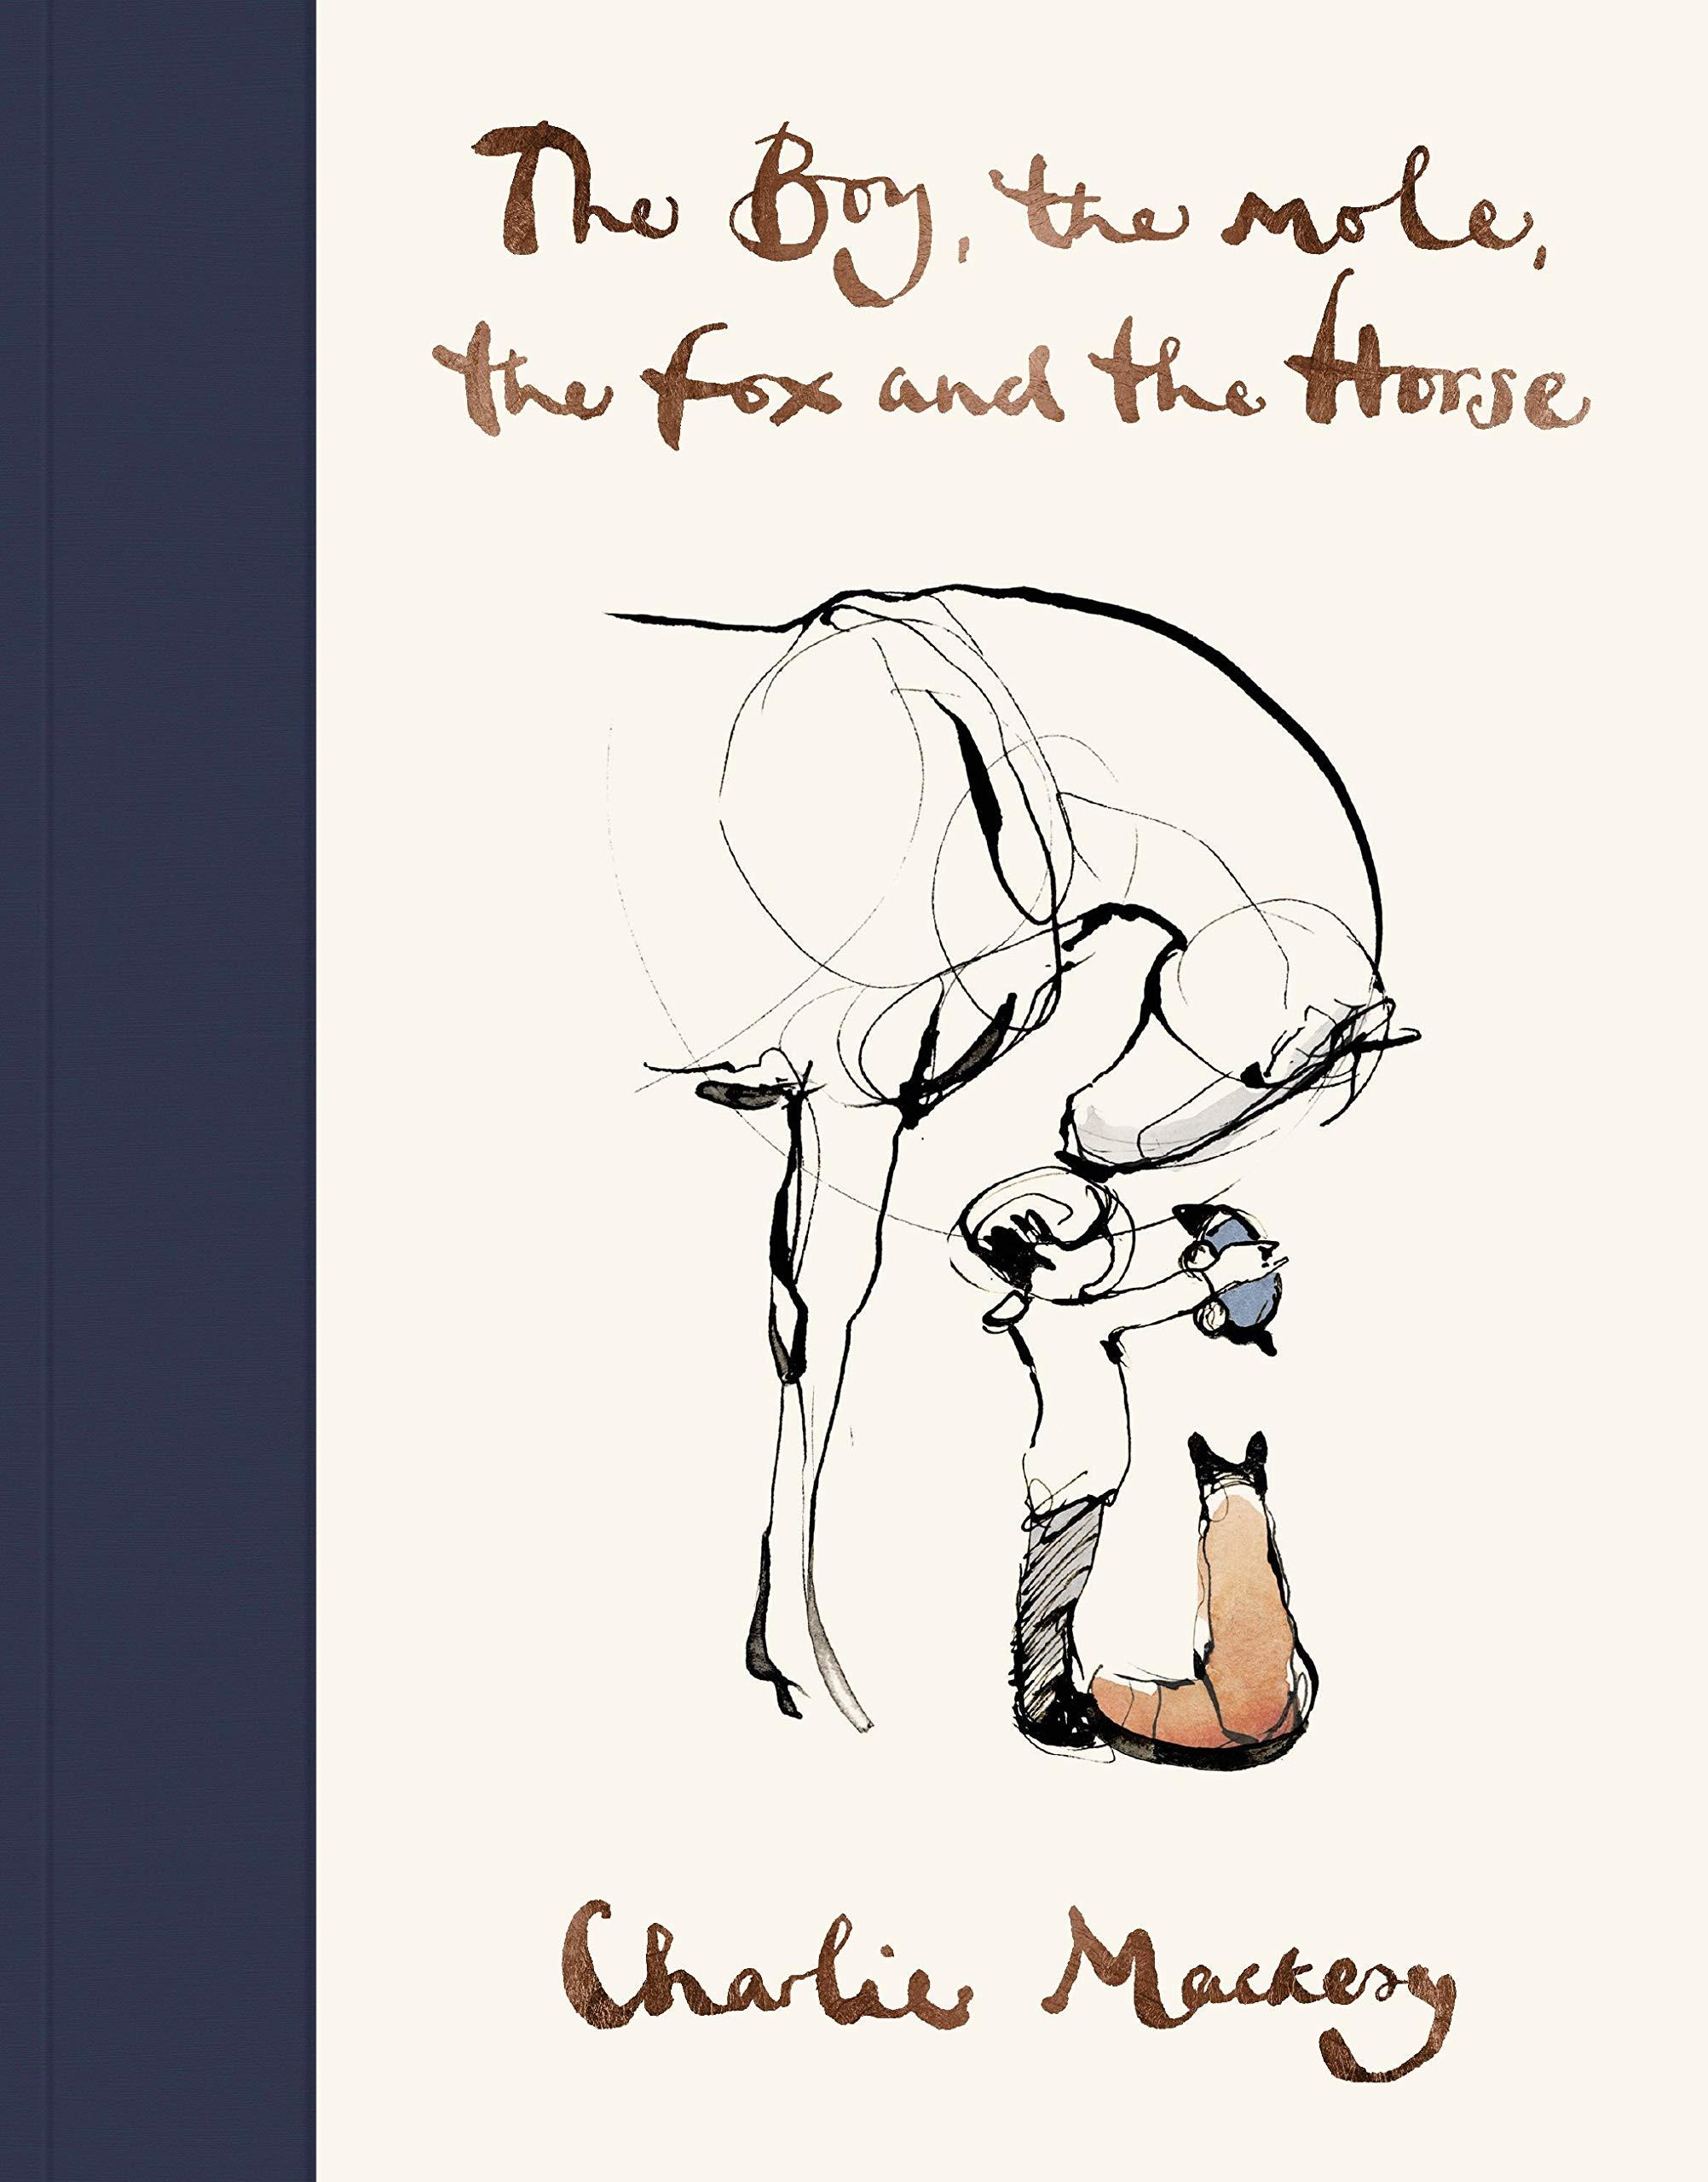 Charlie Mackesy - The Boy, the mole, the fox and the horse